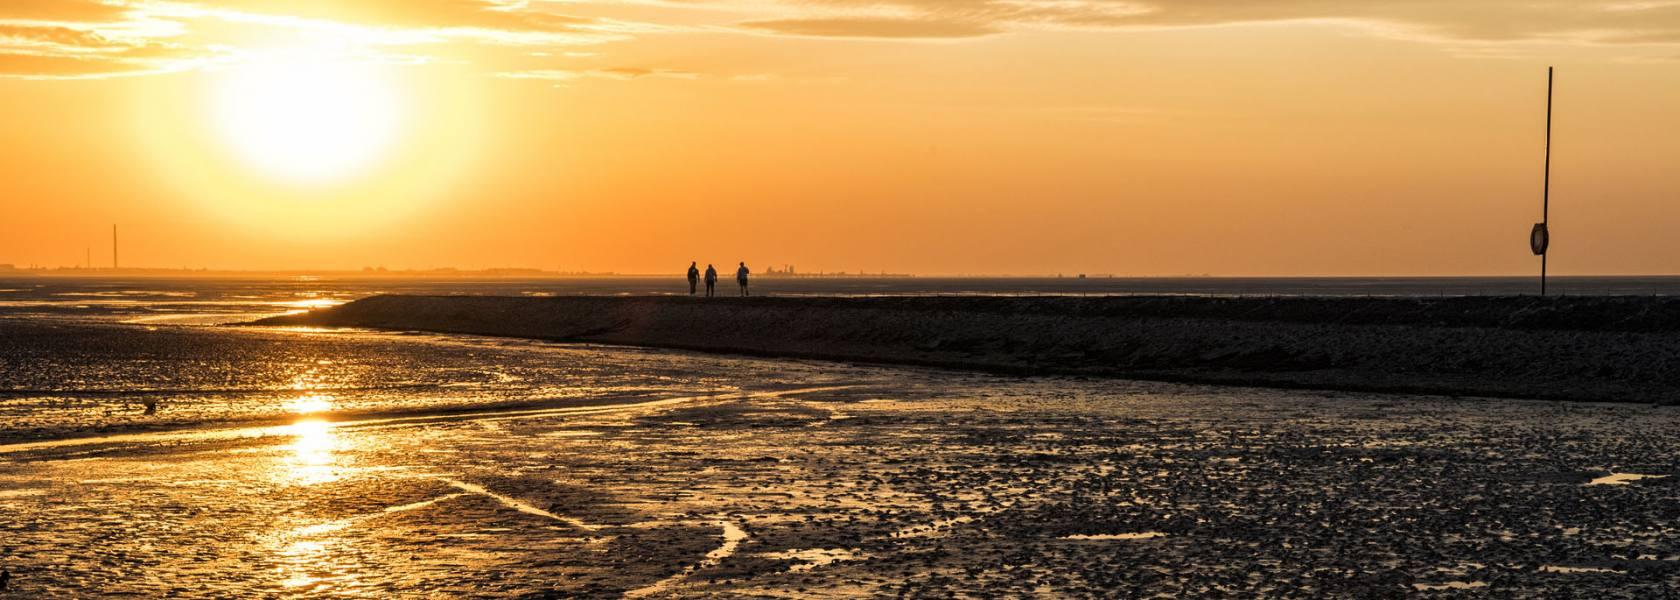 Sonnenuntergang im Wattenmeer, © Florian Trykowski